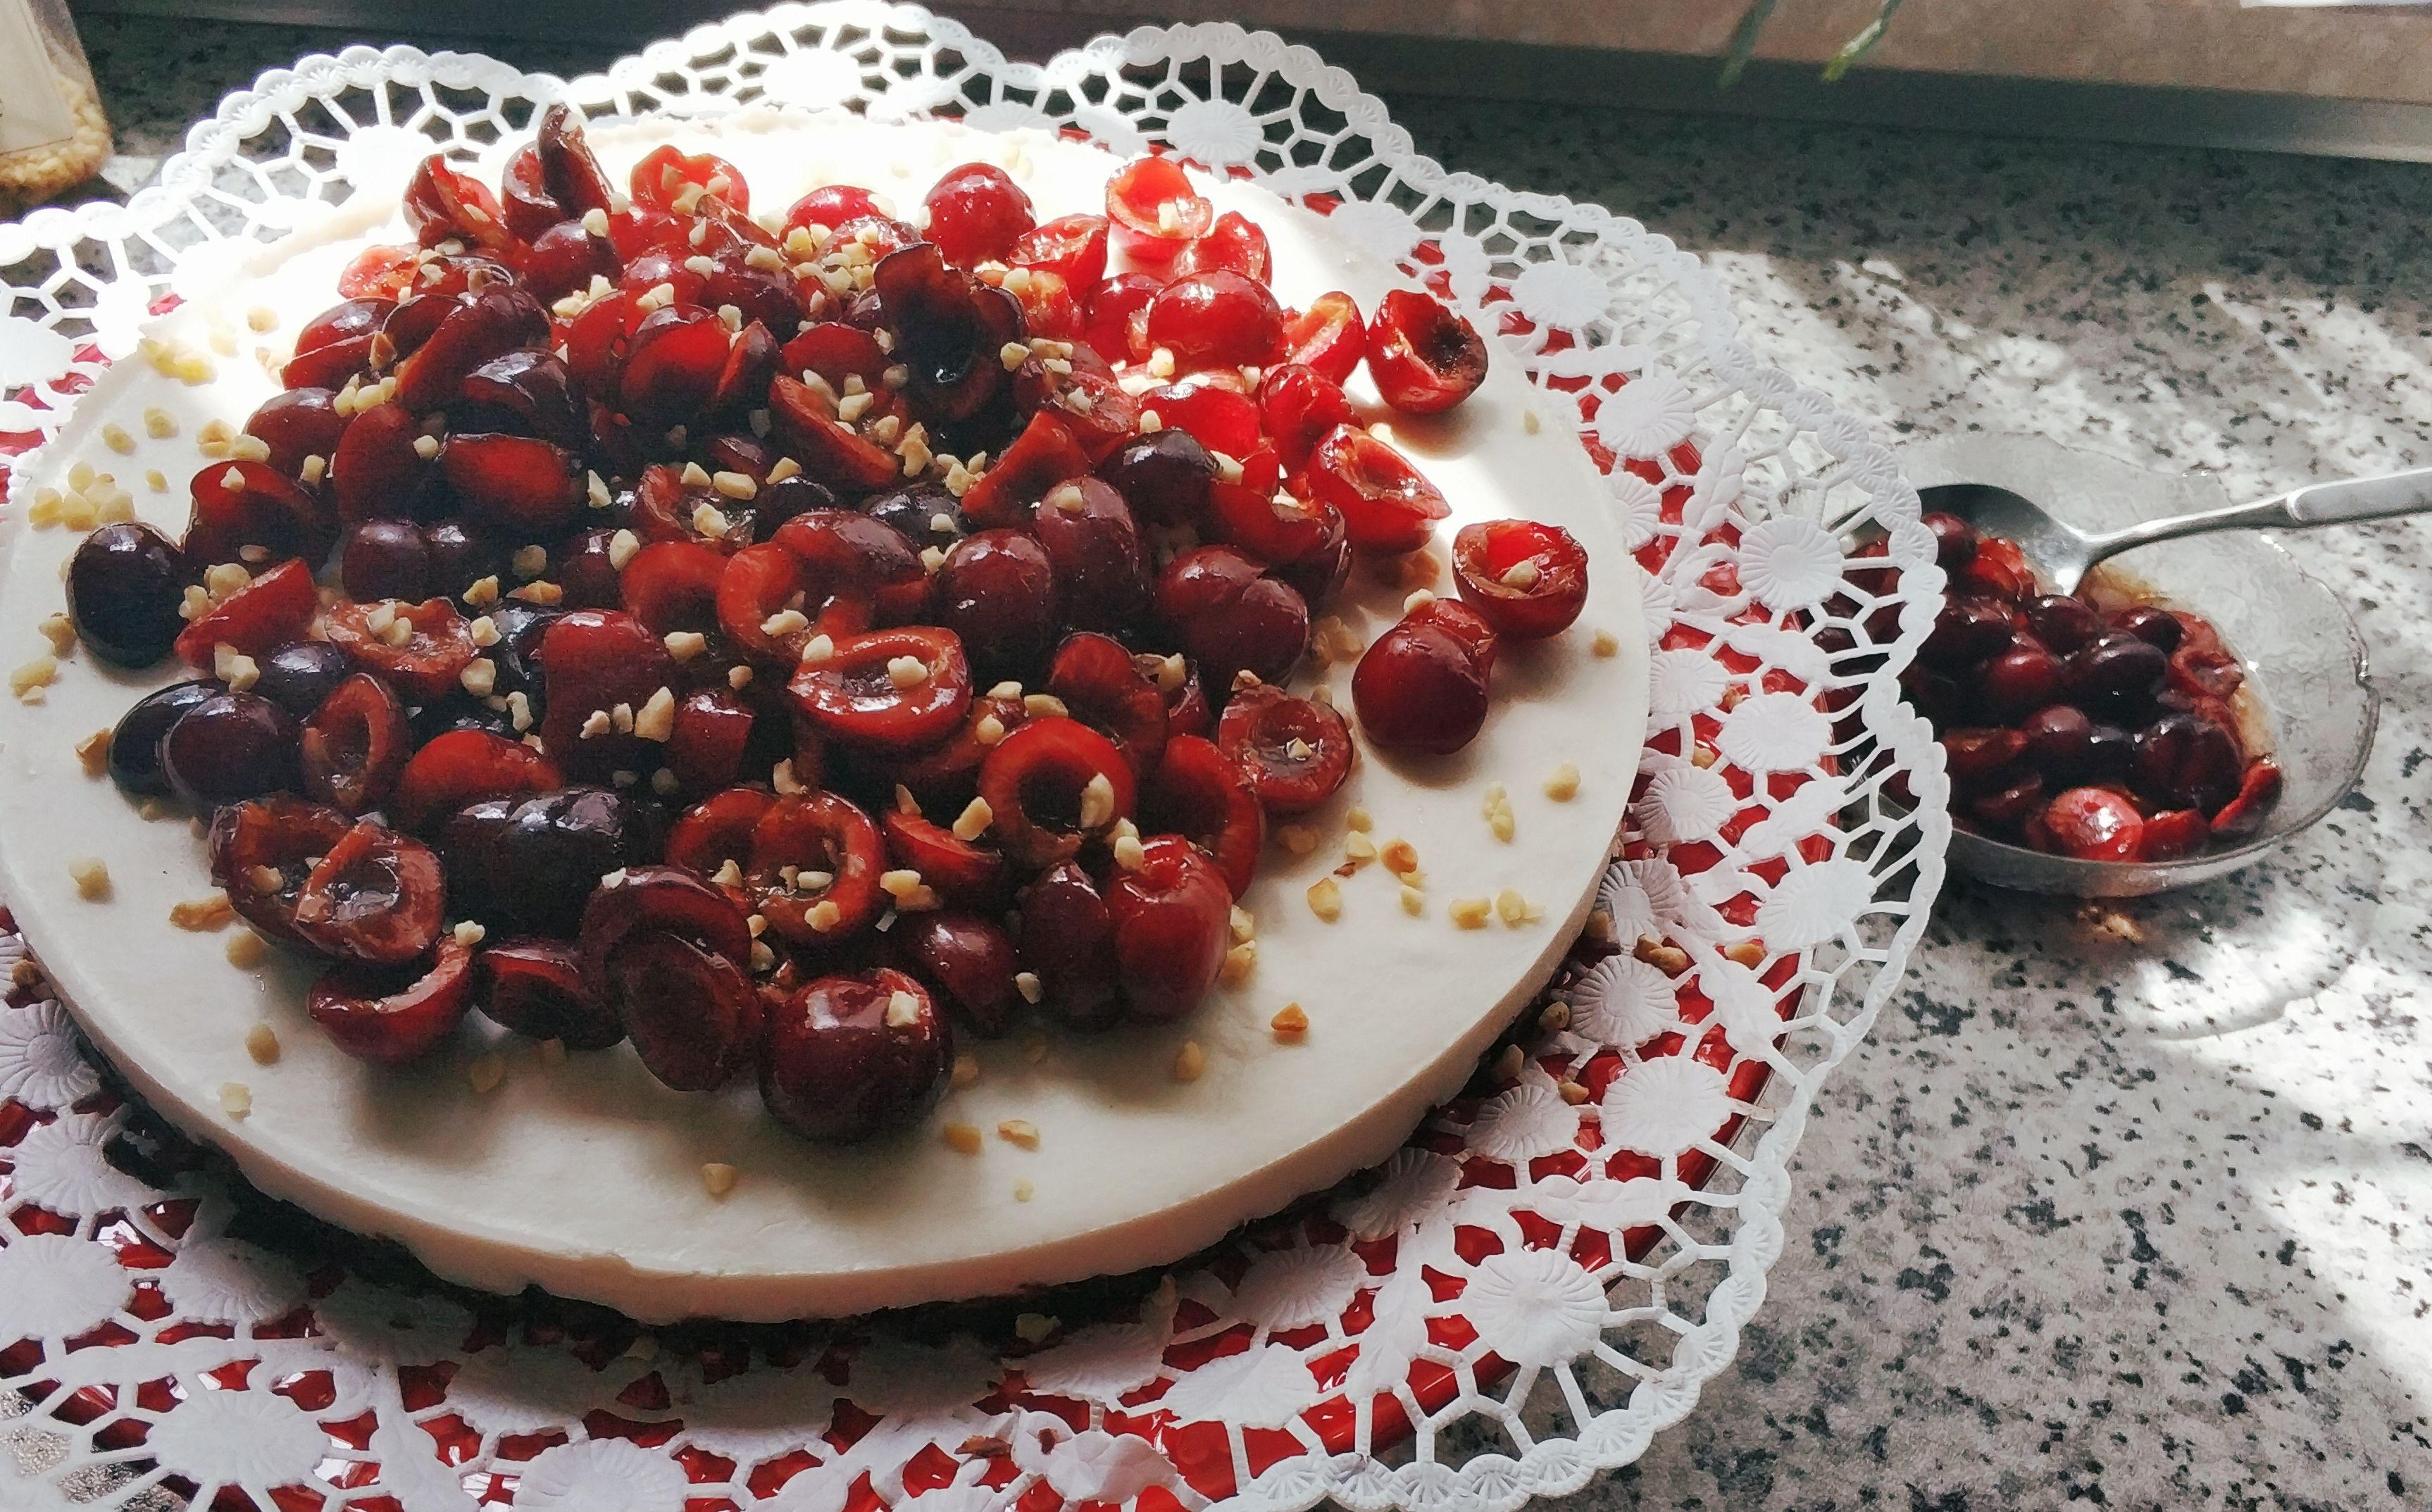 Crispy cheese(less)cake with cherries